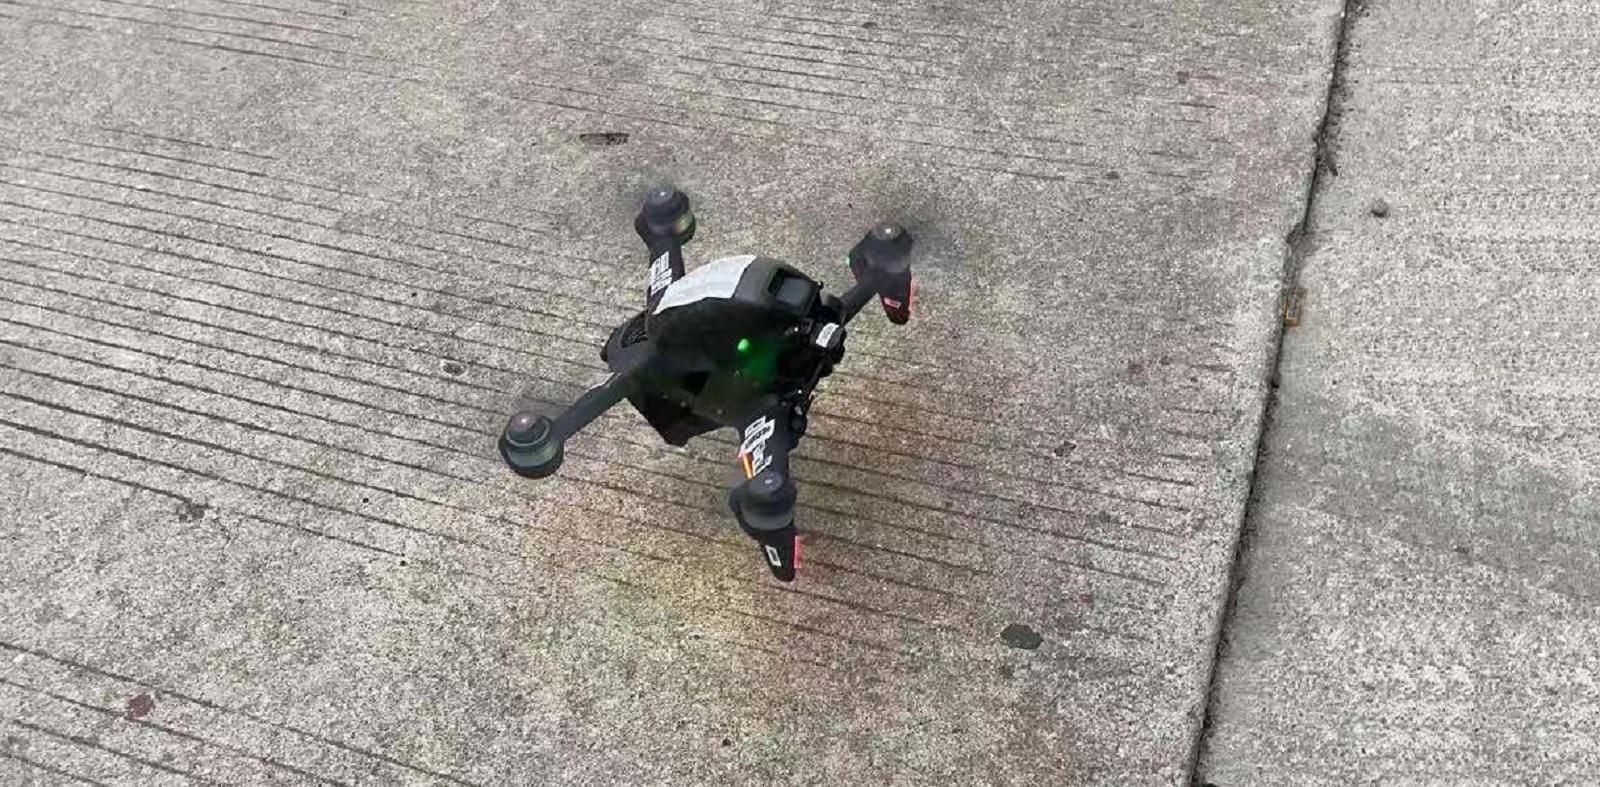 Как вы думаете, полетит ли DJI FPV-дрон?